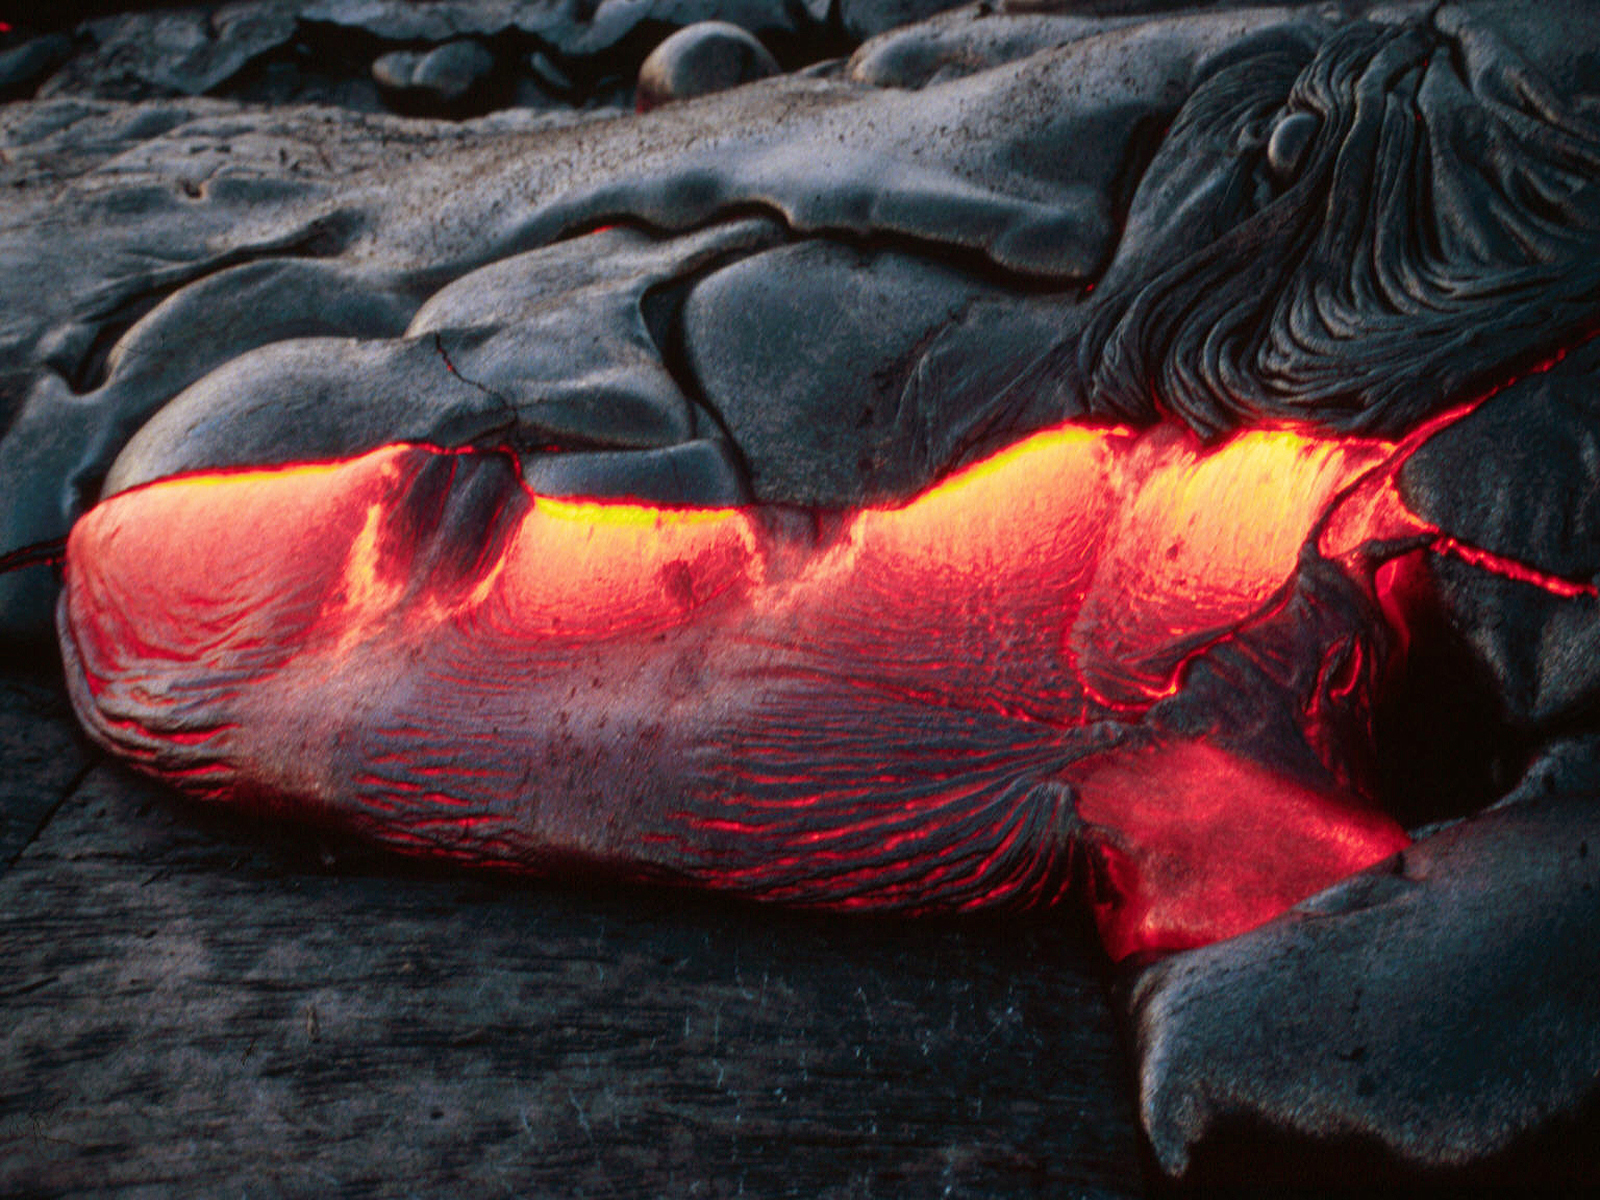 http://2.bp.blogspot.com/-j8FF7v-0FKM/TyWaduDCbwI/AAAAAAAAAOc/VP3LNPuLY8c/s1600/volcano-lava_20.jpg